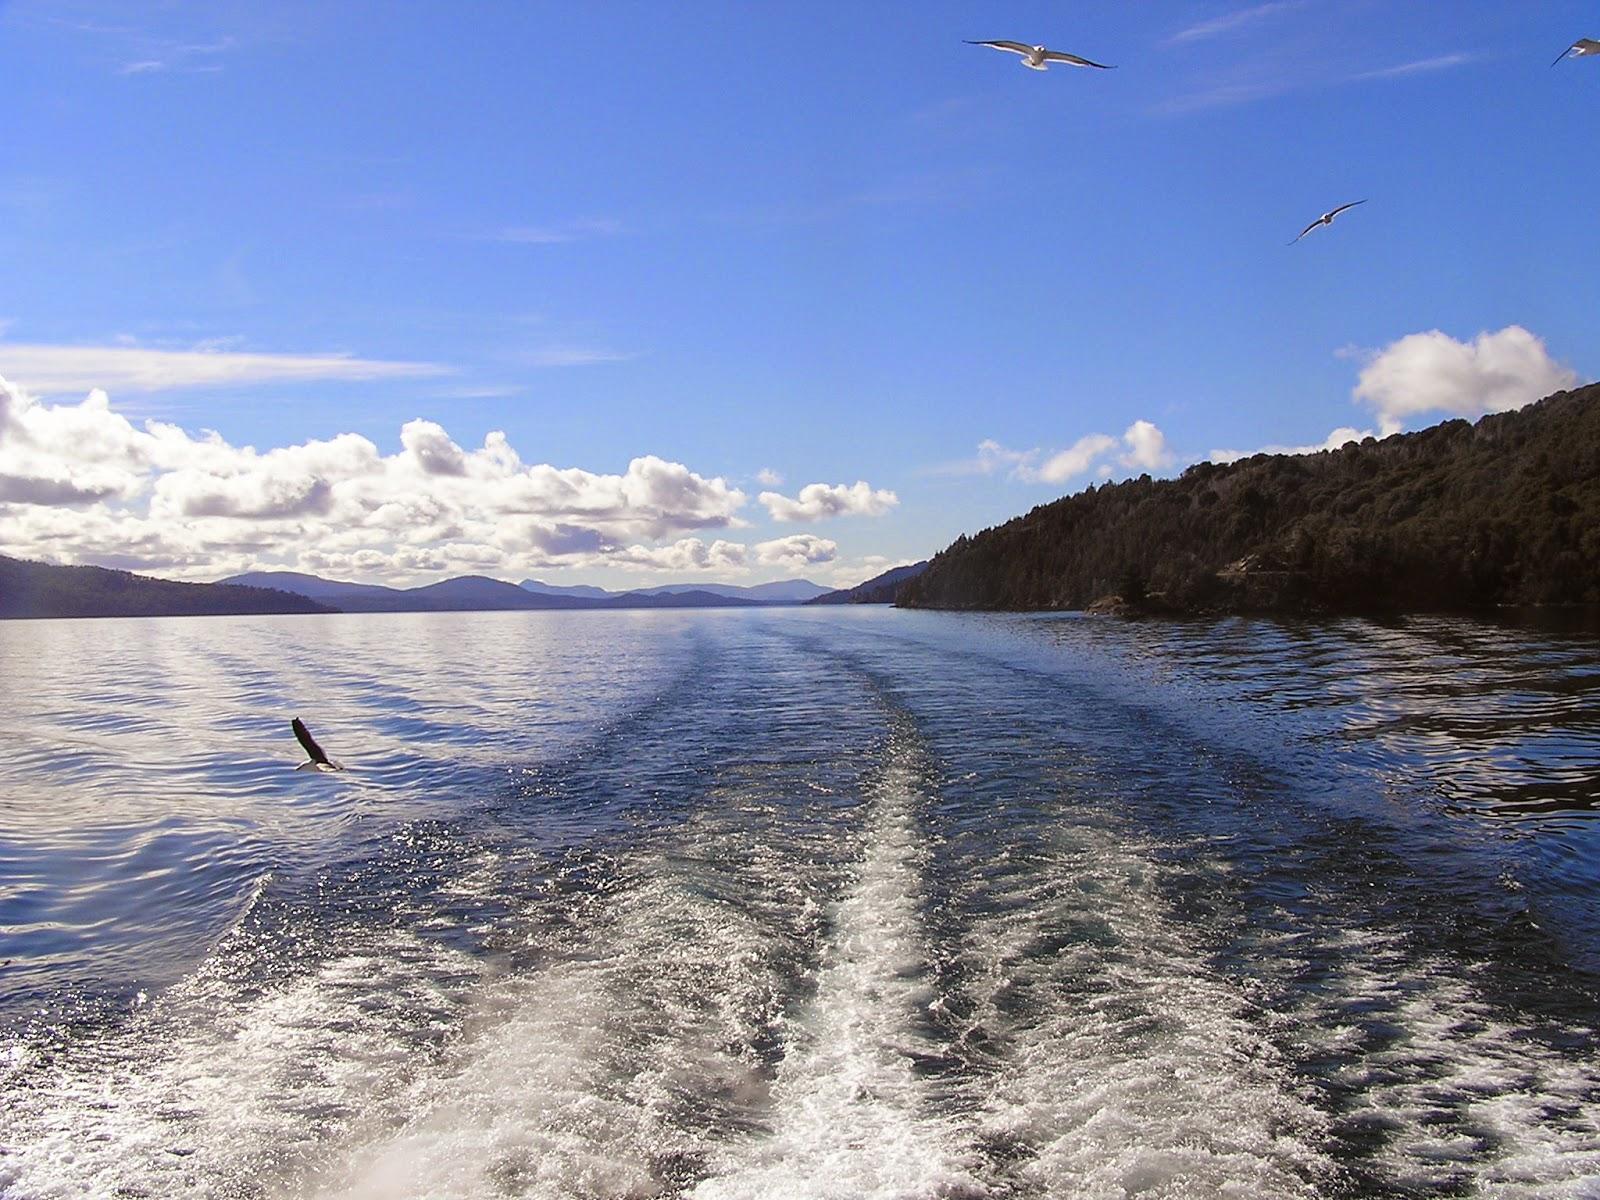 Nahuel Huapi, San Carlos de Bariloche, Argentina, Elisa N, Blog de Viajes, Lifestyle, Travel